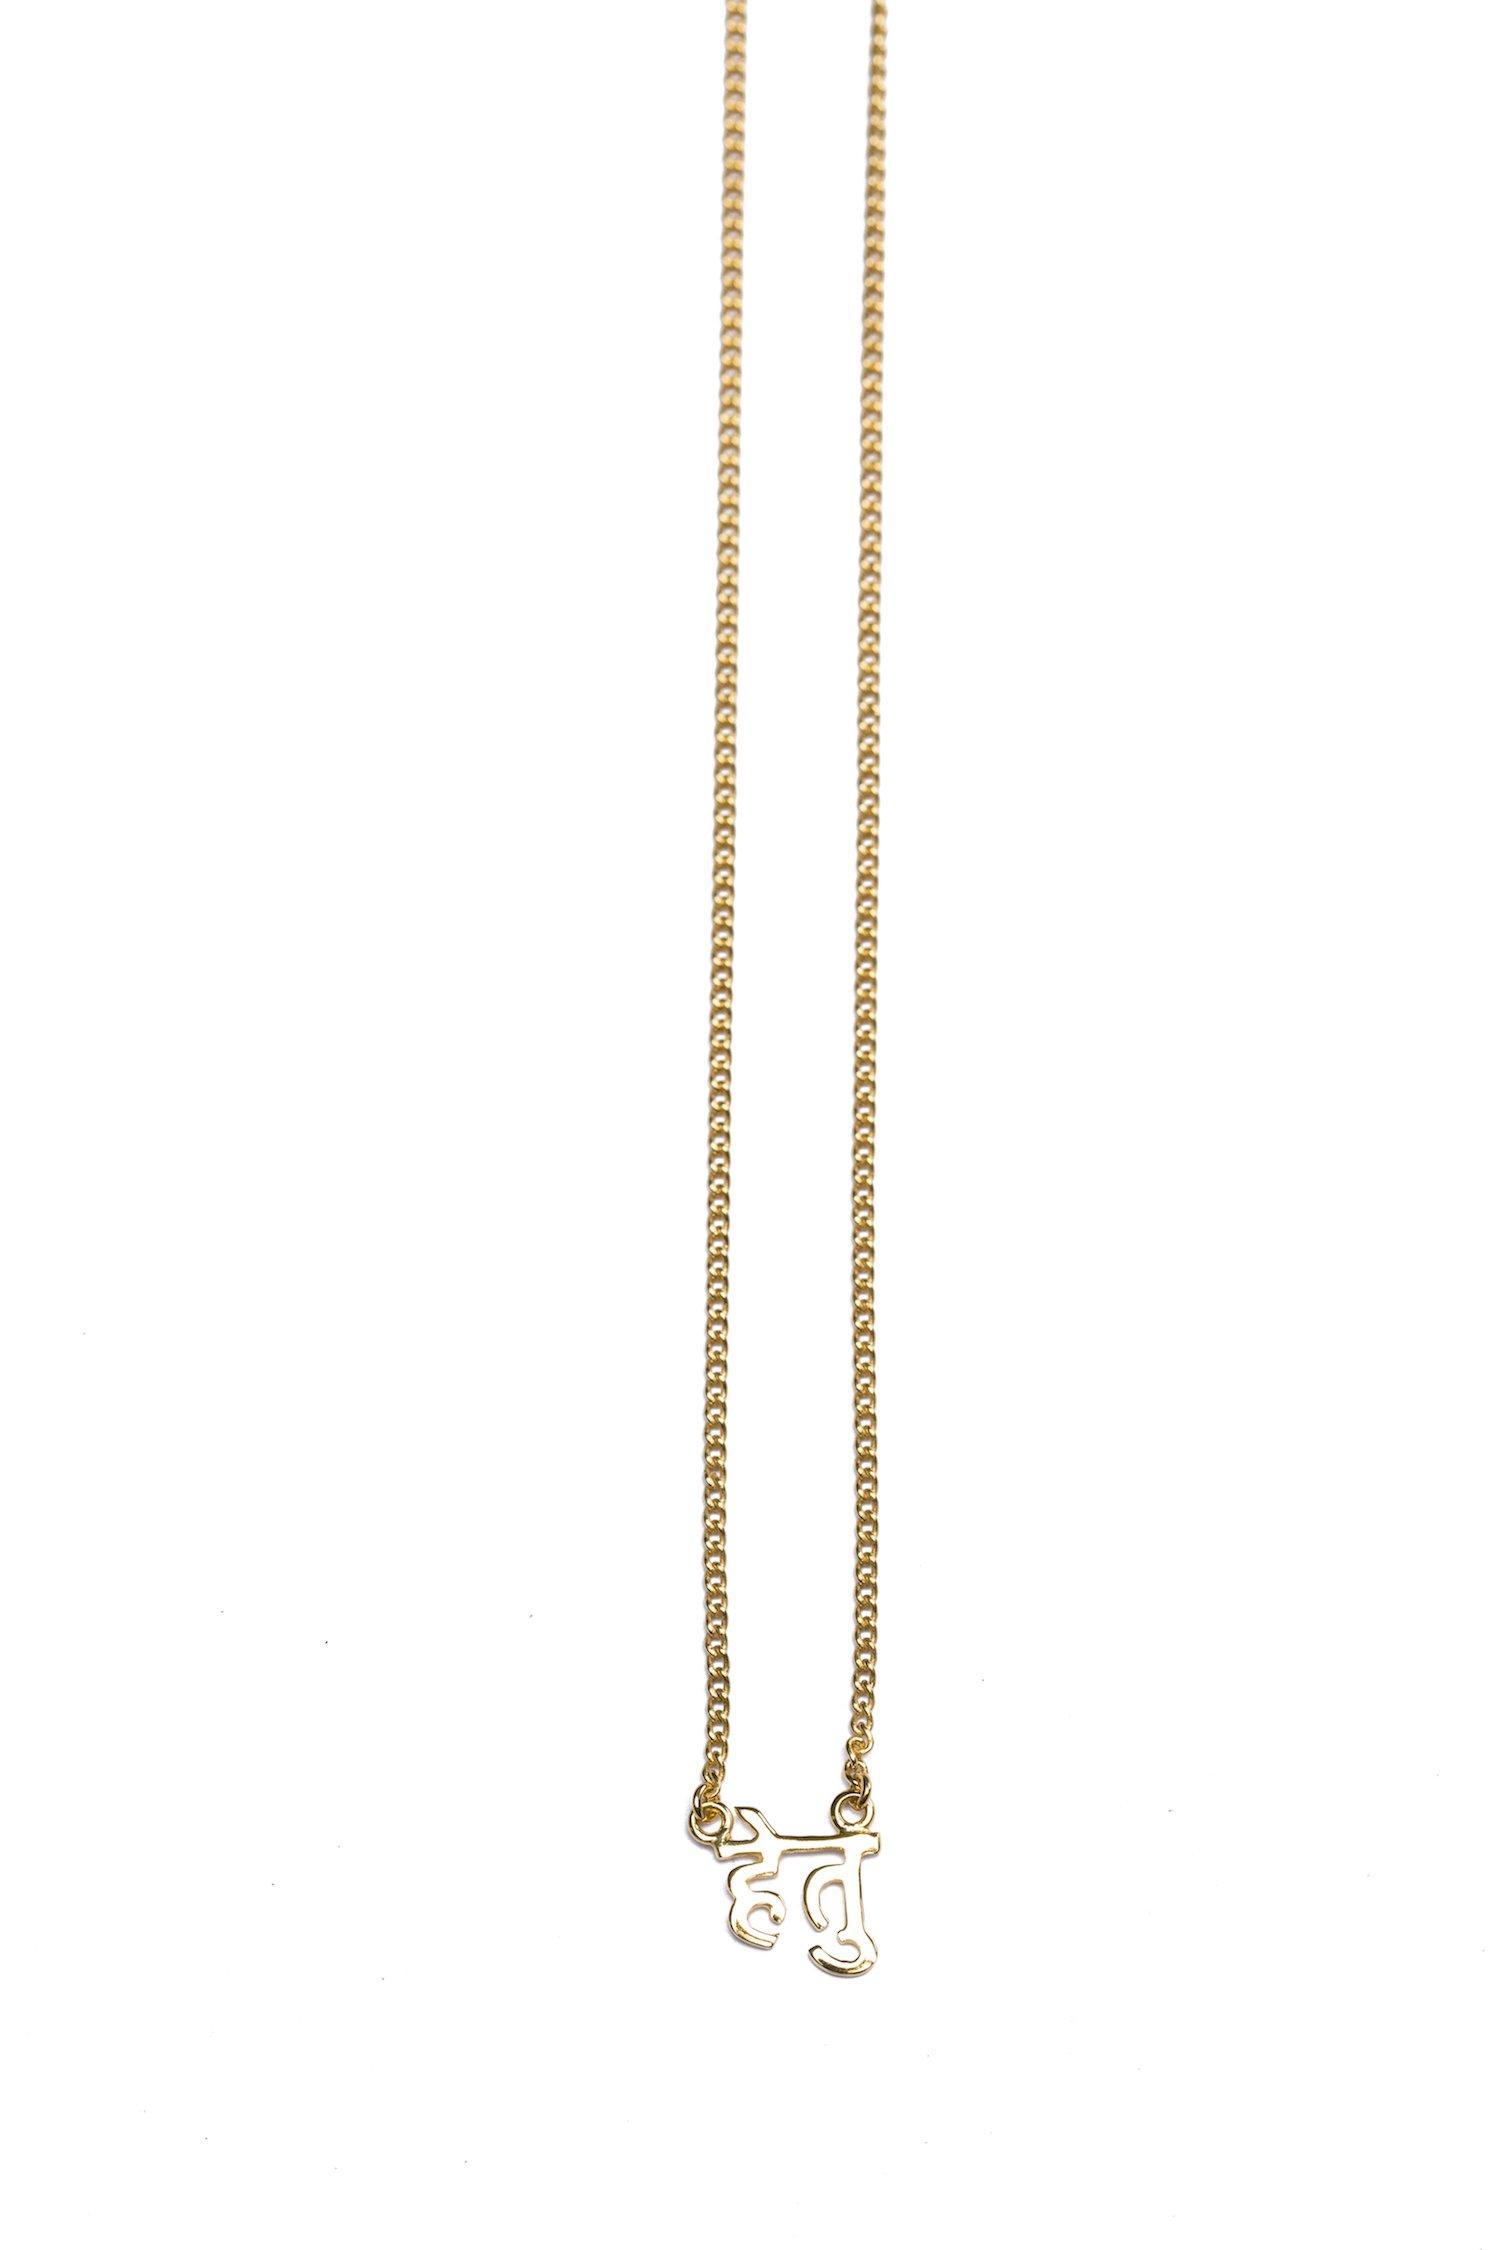 Purpose - Sanskrit Necklace (Gold)